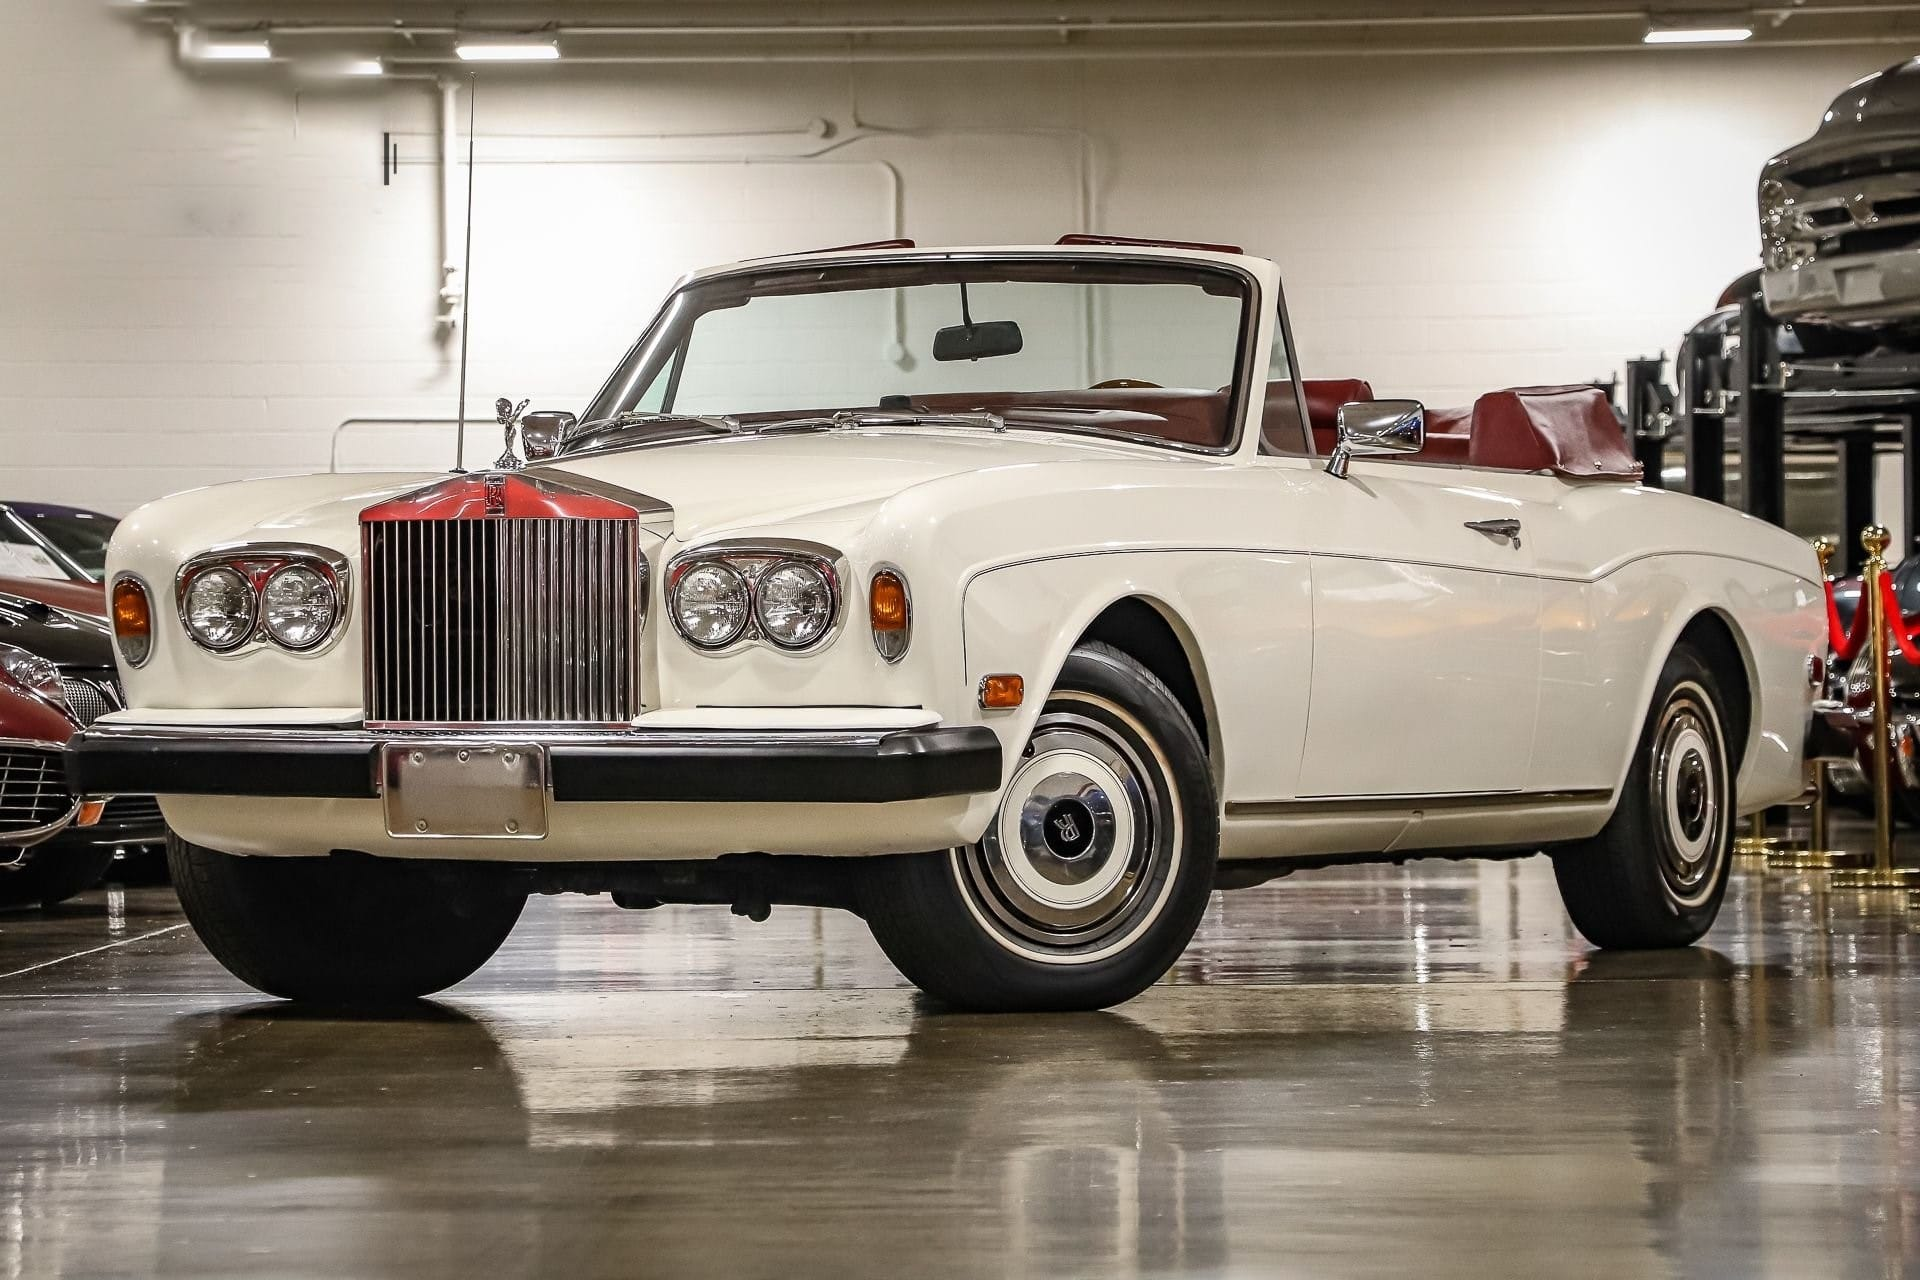 Rolls Royce Corniche 1980 à vendre European Vintage Cars